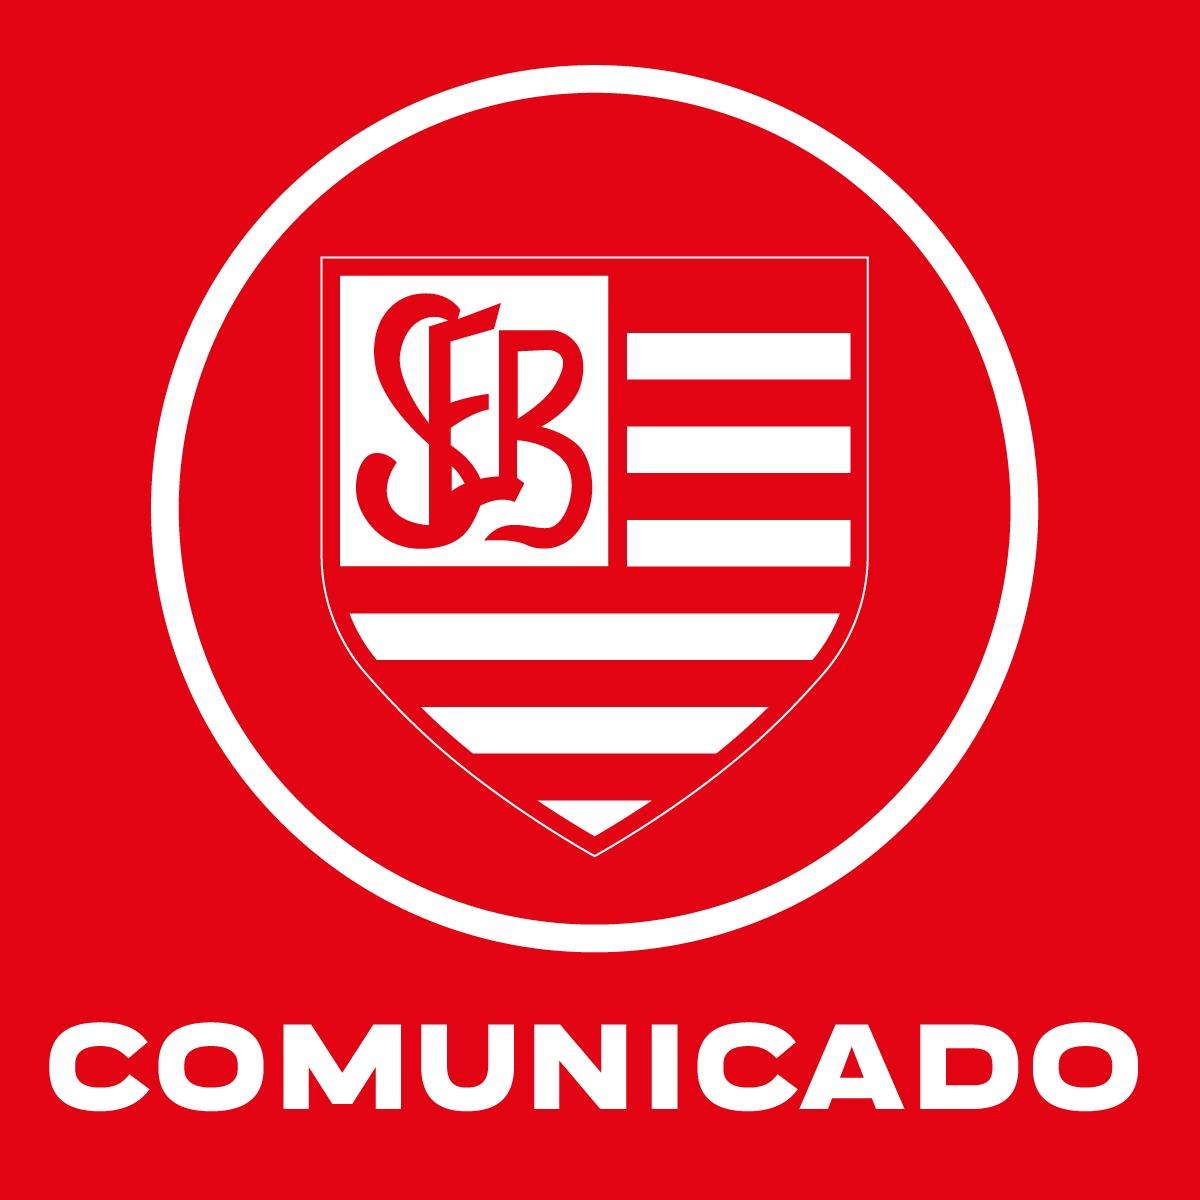 Comunicado: Decreto Estadual Nº 1.168